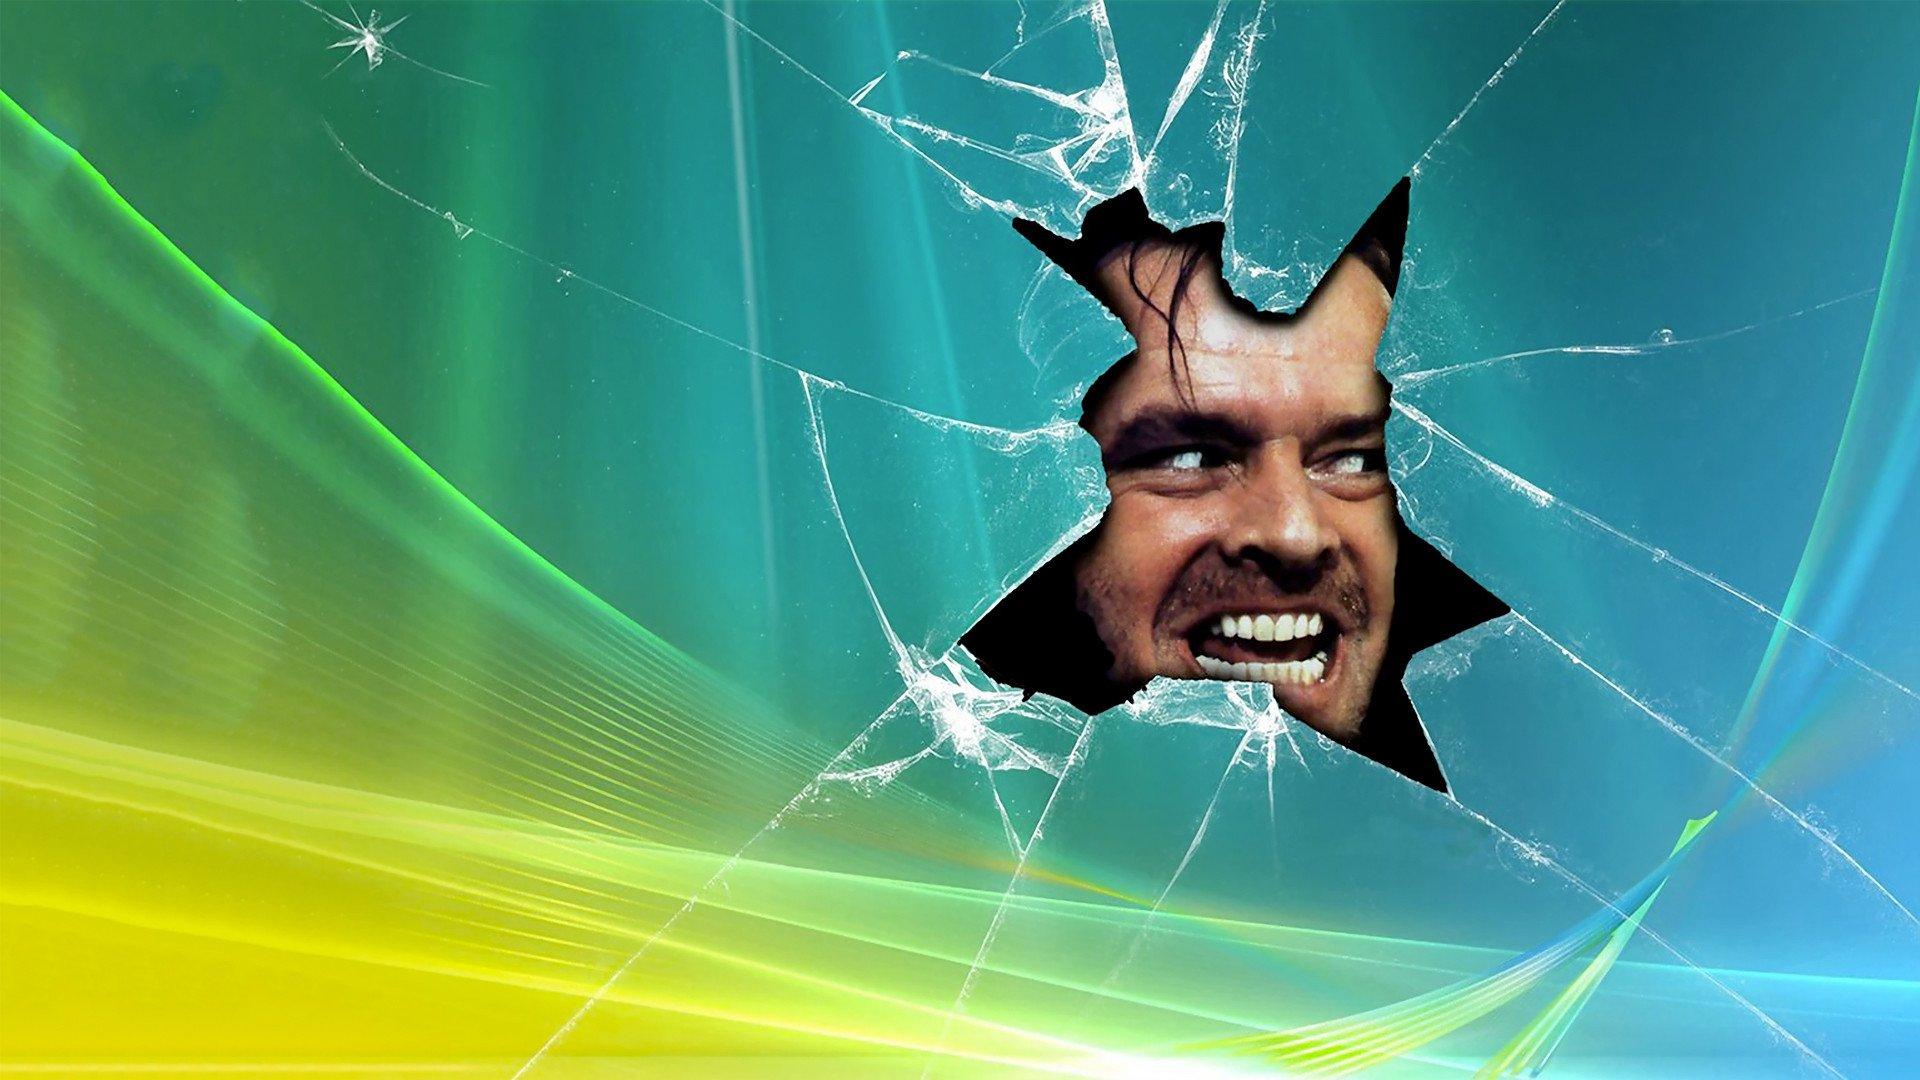 THE SHINING horror thriller dark movie film classic shatter glass 1920x1080